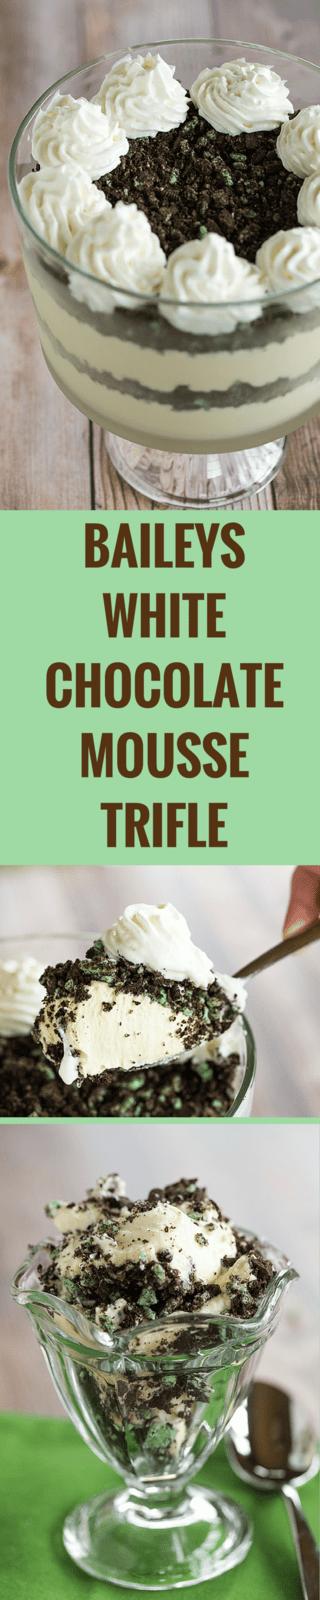 Baileys White Chocolate Mousse Trifle